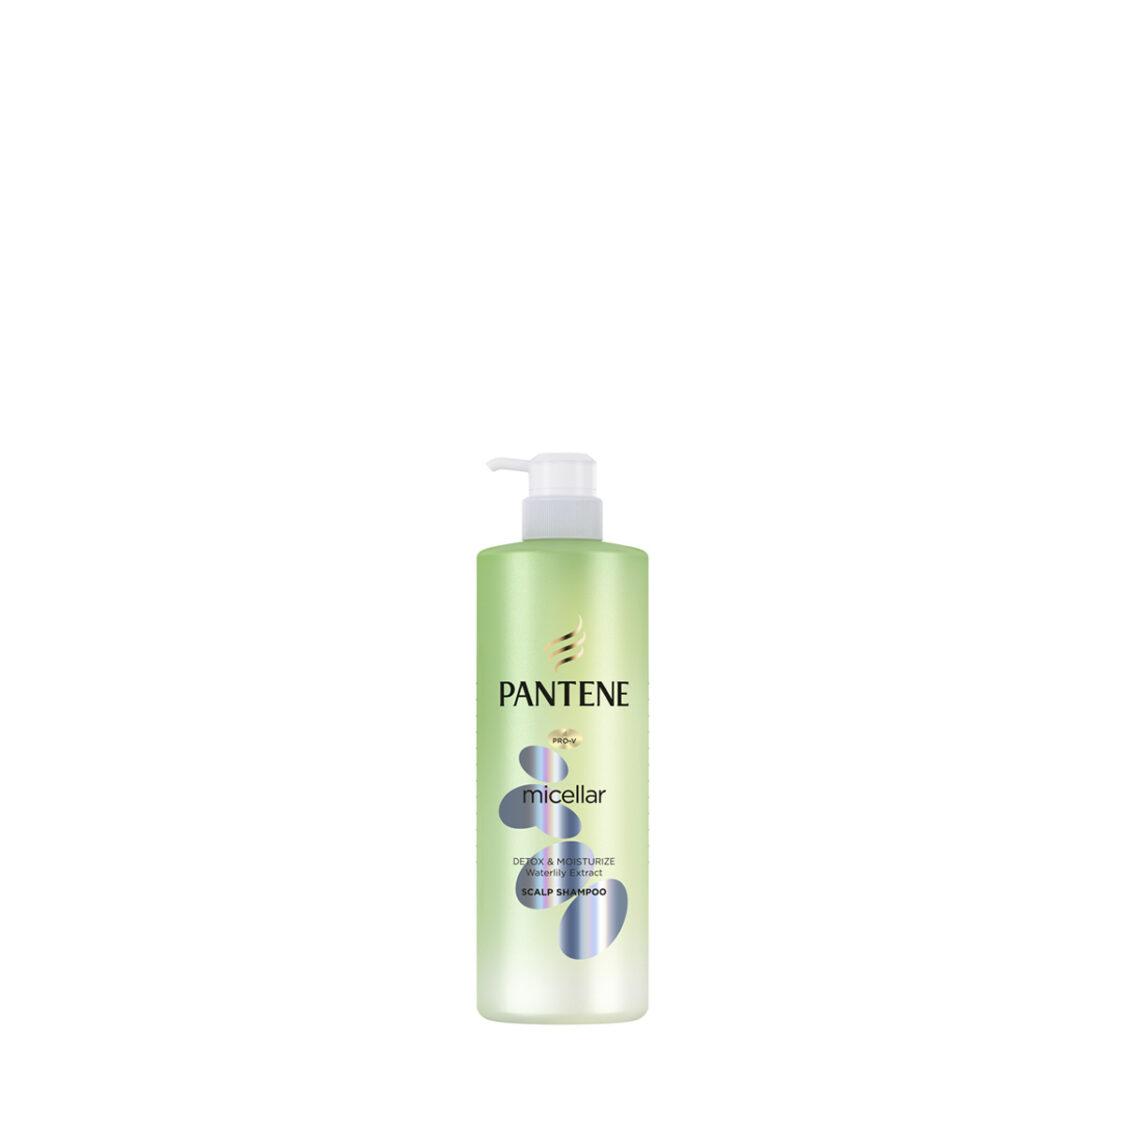 Pantene Shampoo Micellar Detox  Moisturize 530ml